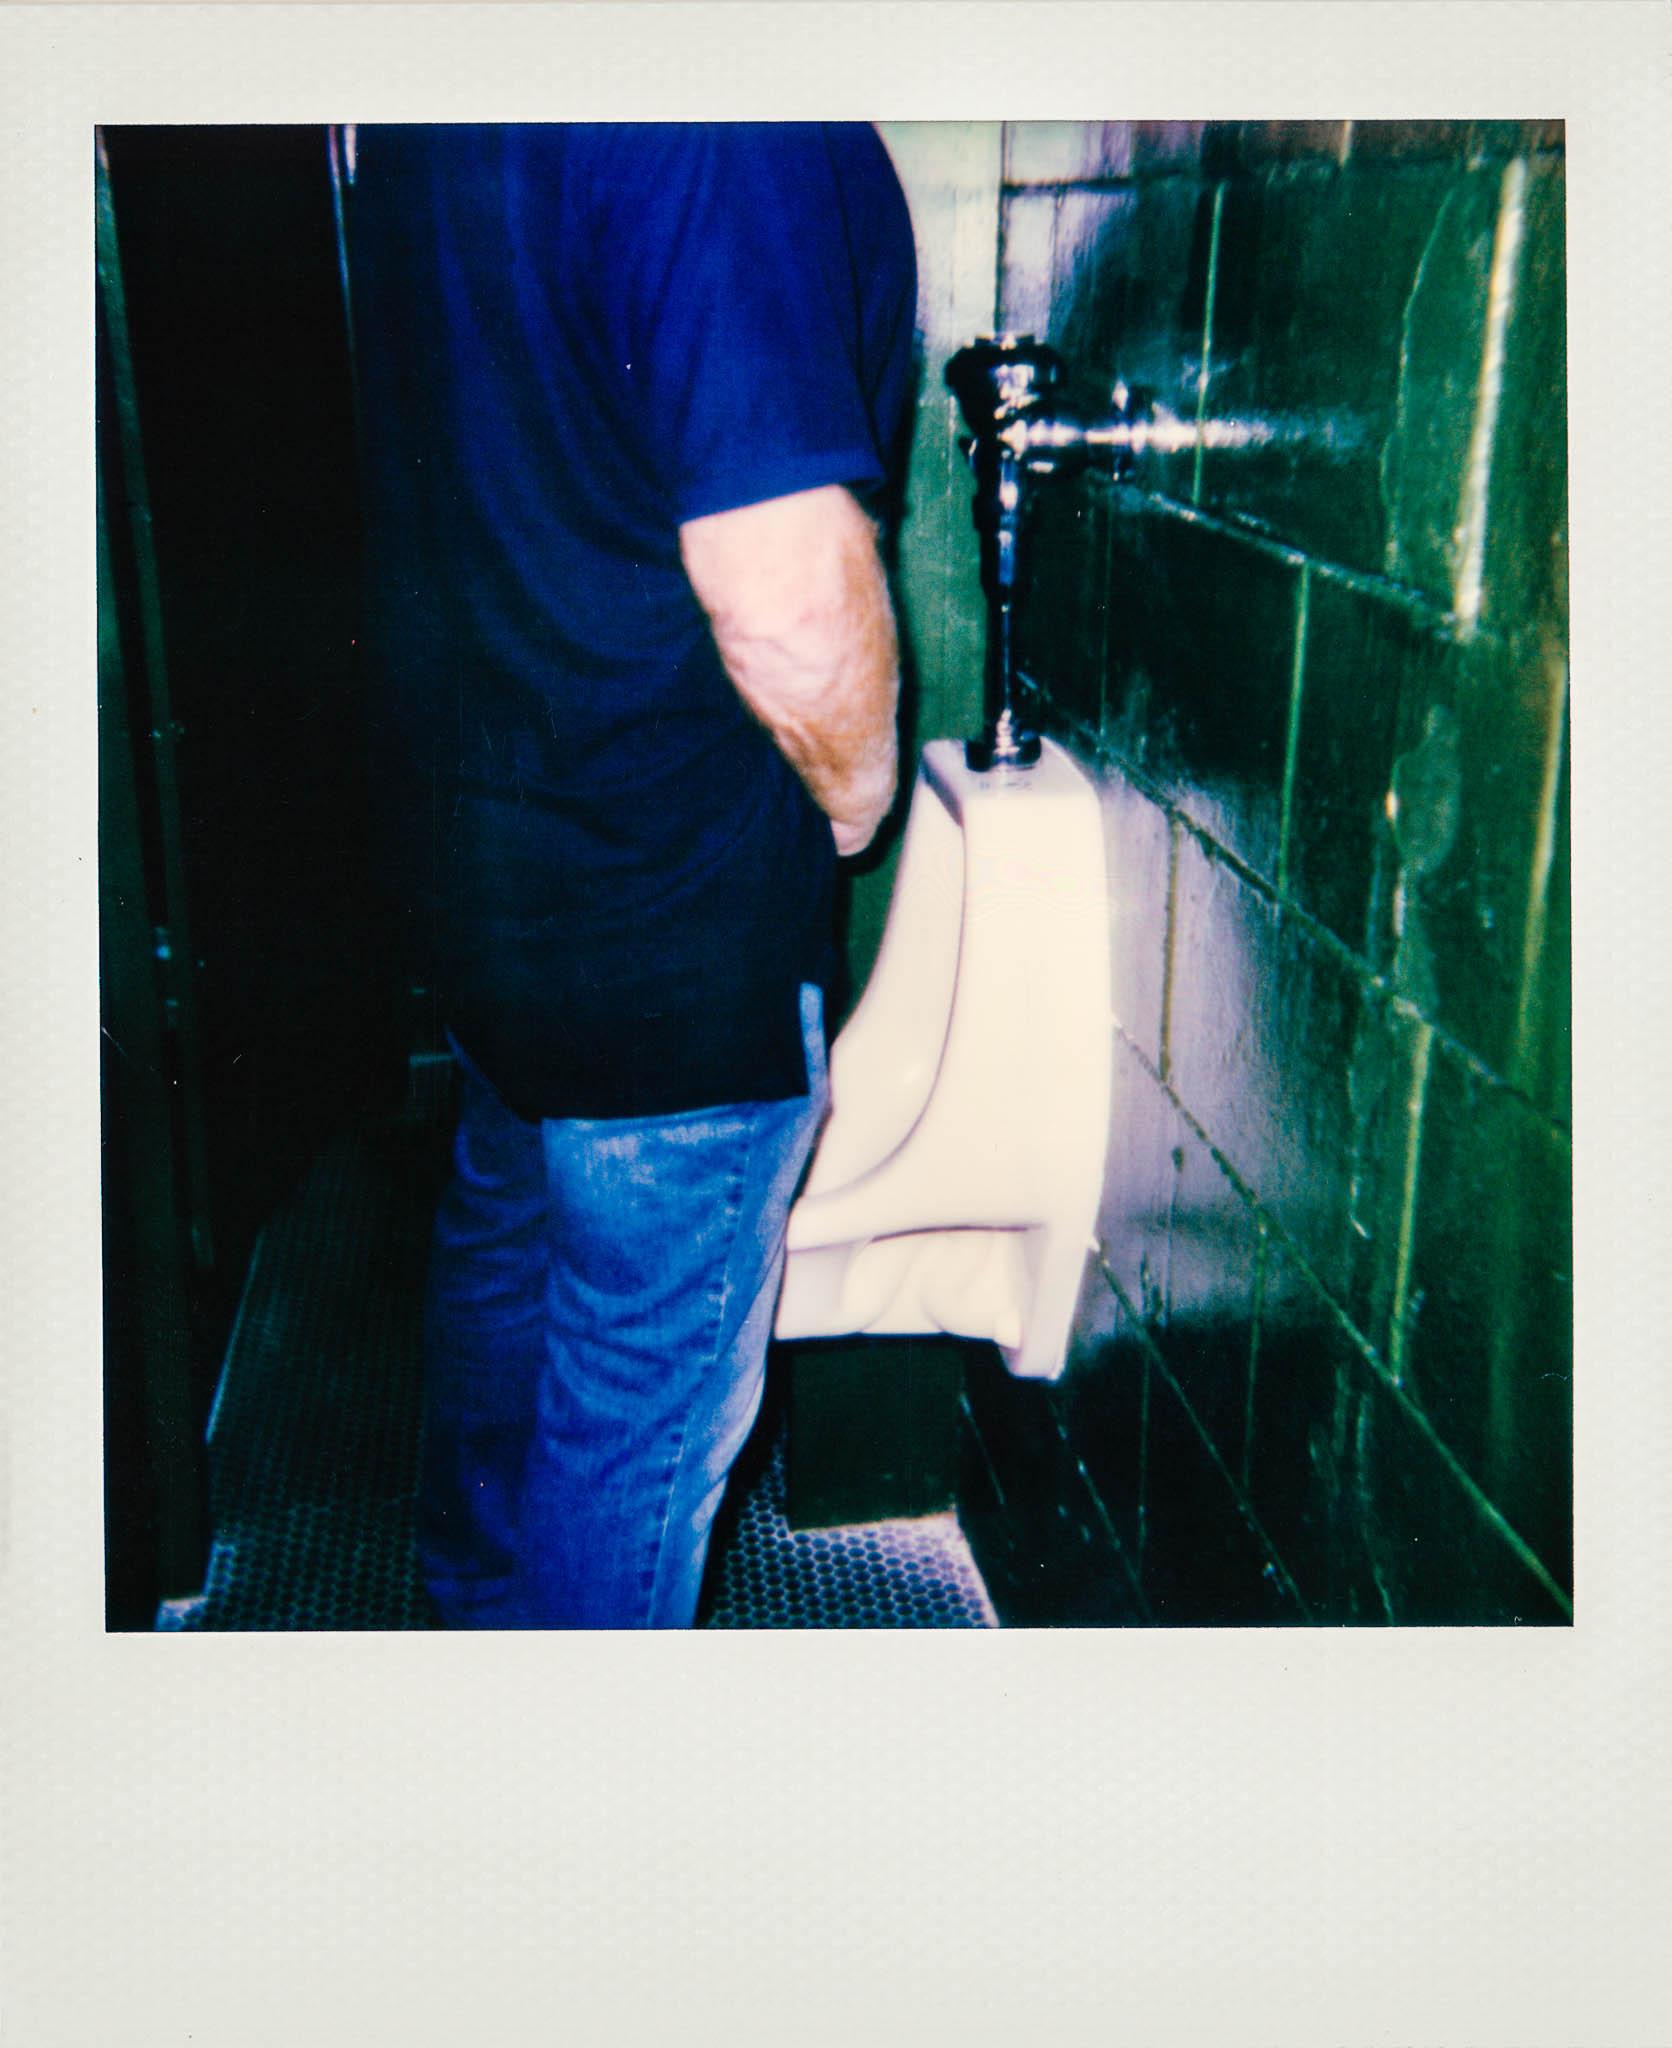 Man peeing in urinal at Wallys Mills Avenue Liquors